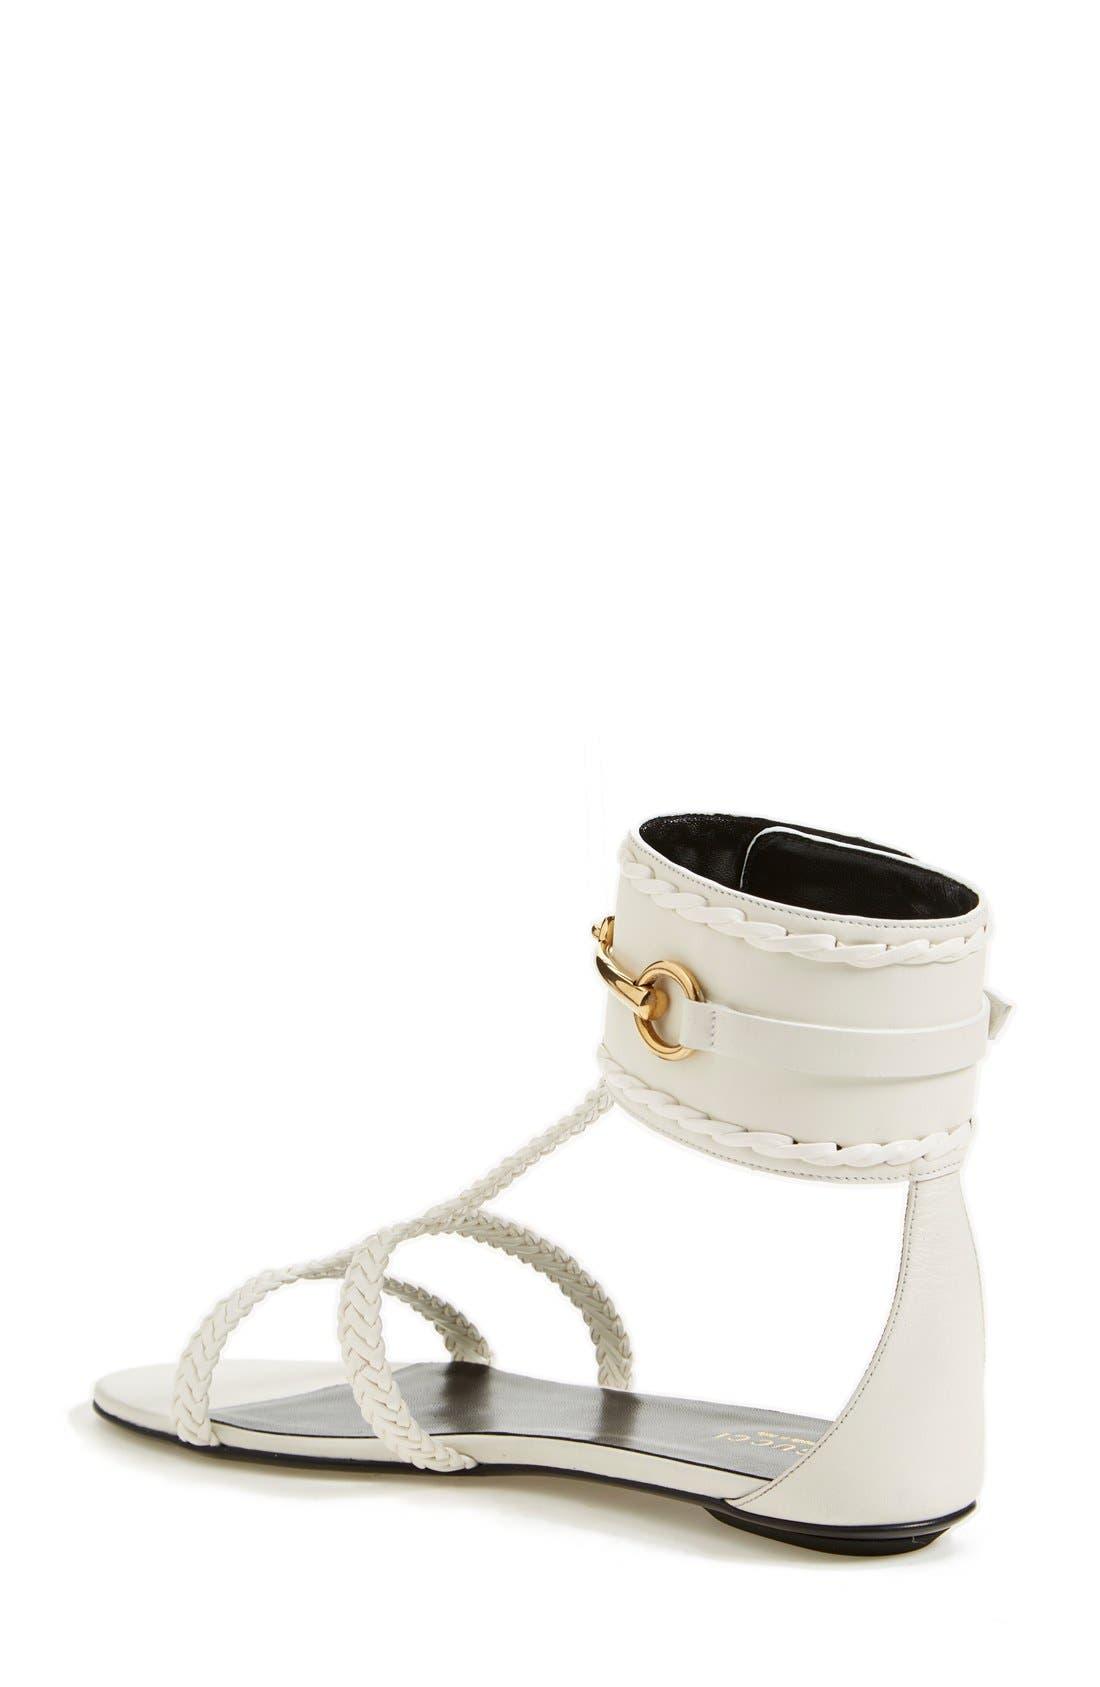 Alternate Image 2  - Gucci 'Ursula' Braided Flat Sandal (Women)